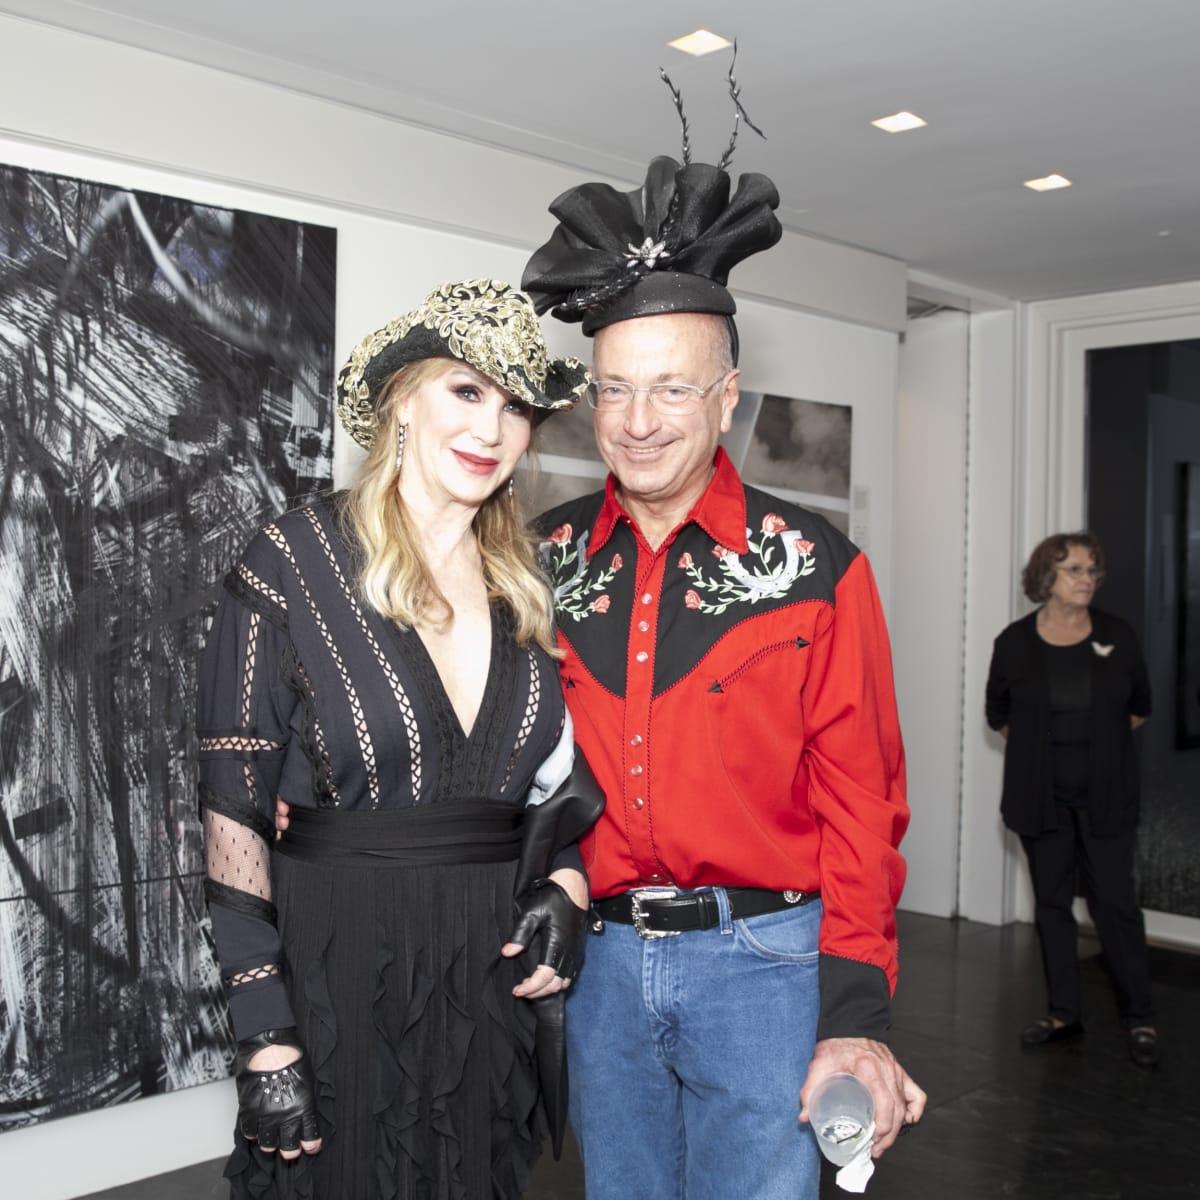 Angie Barrett and Joe Quinn